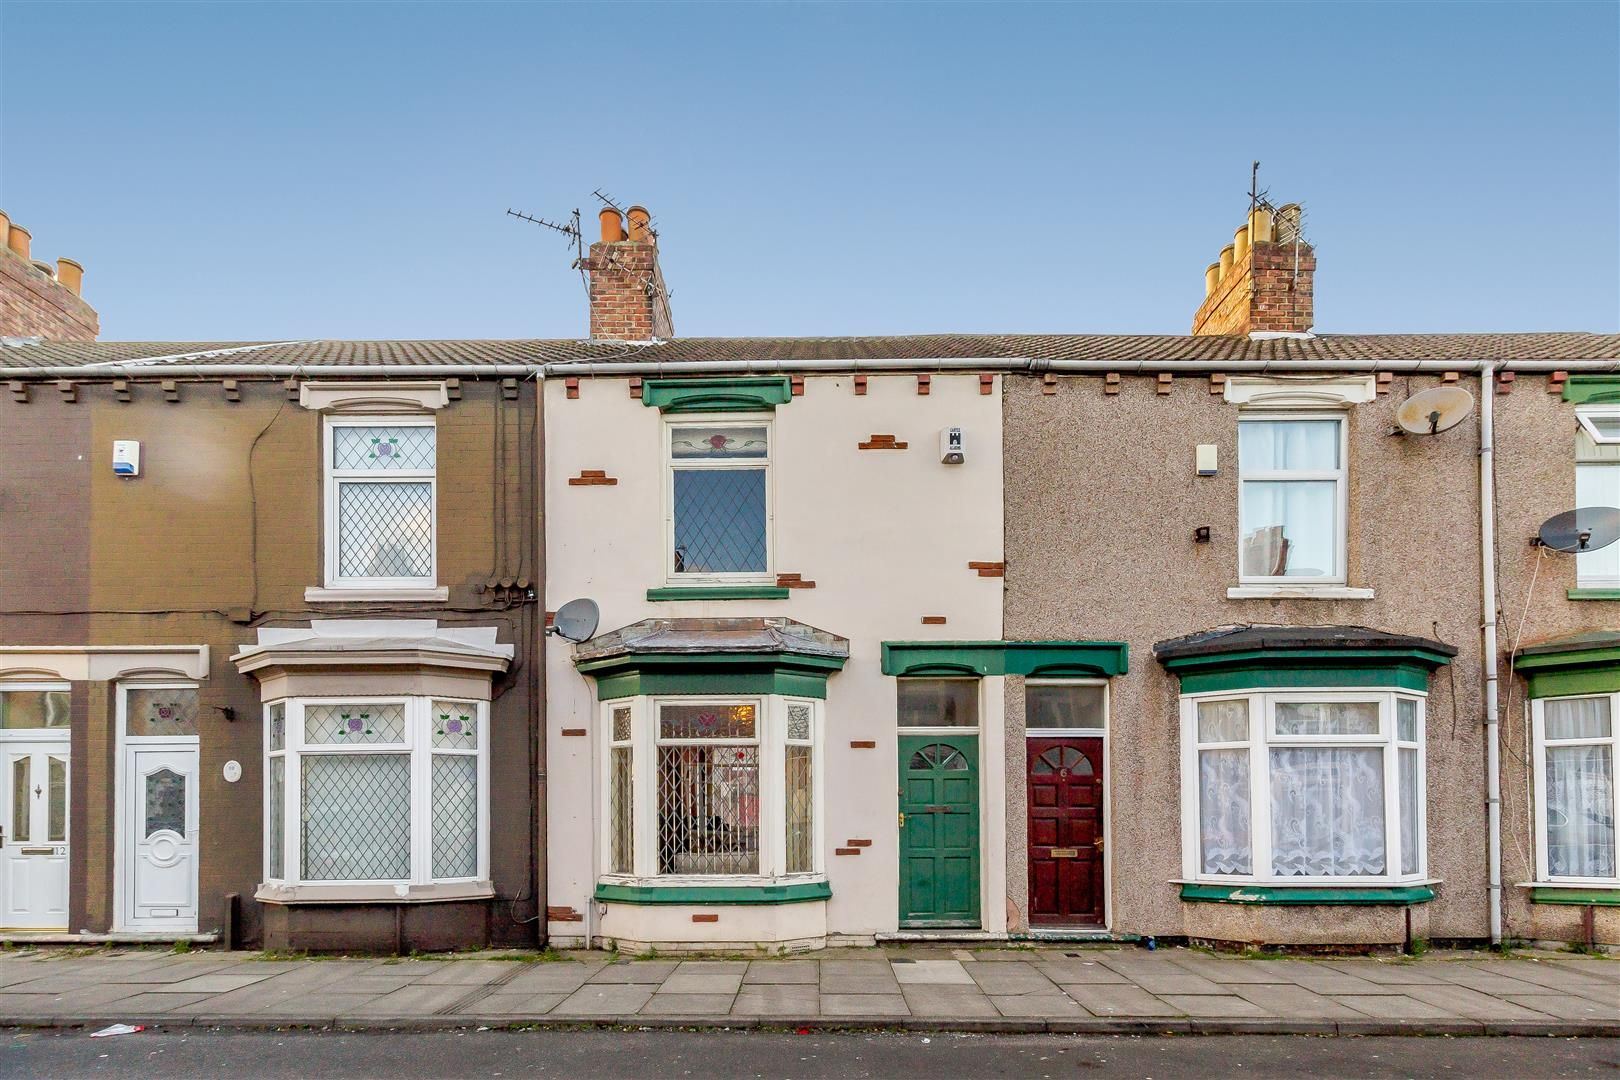 Property photo 1 of 16. 8454069-Exterior01.Jpg